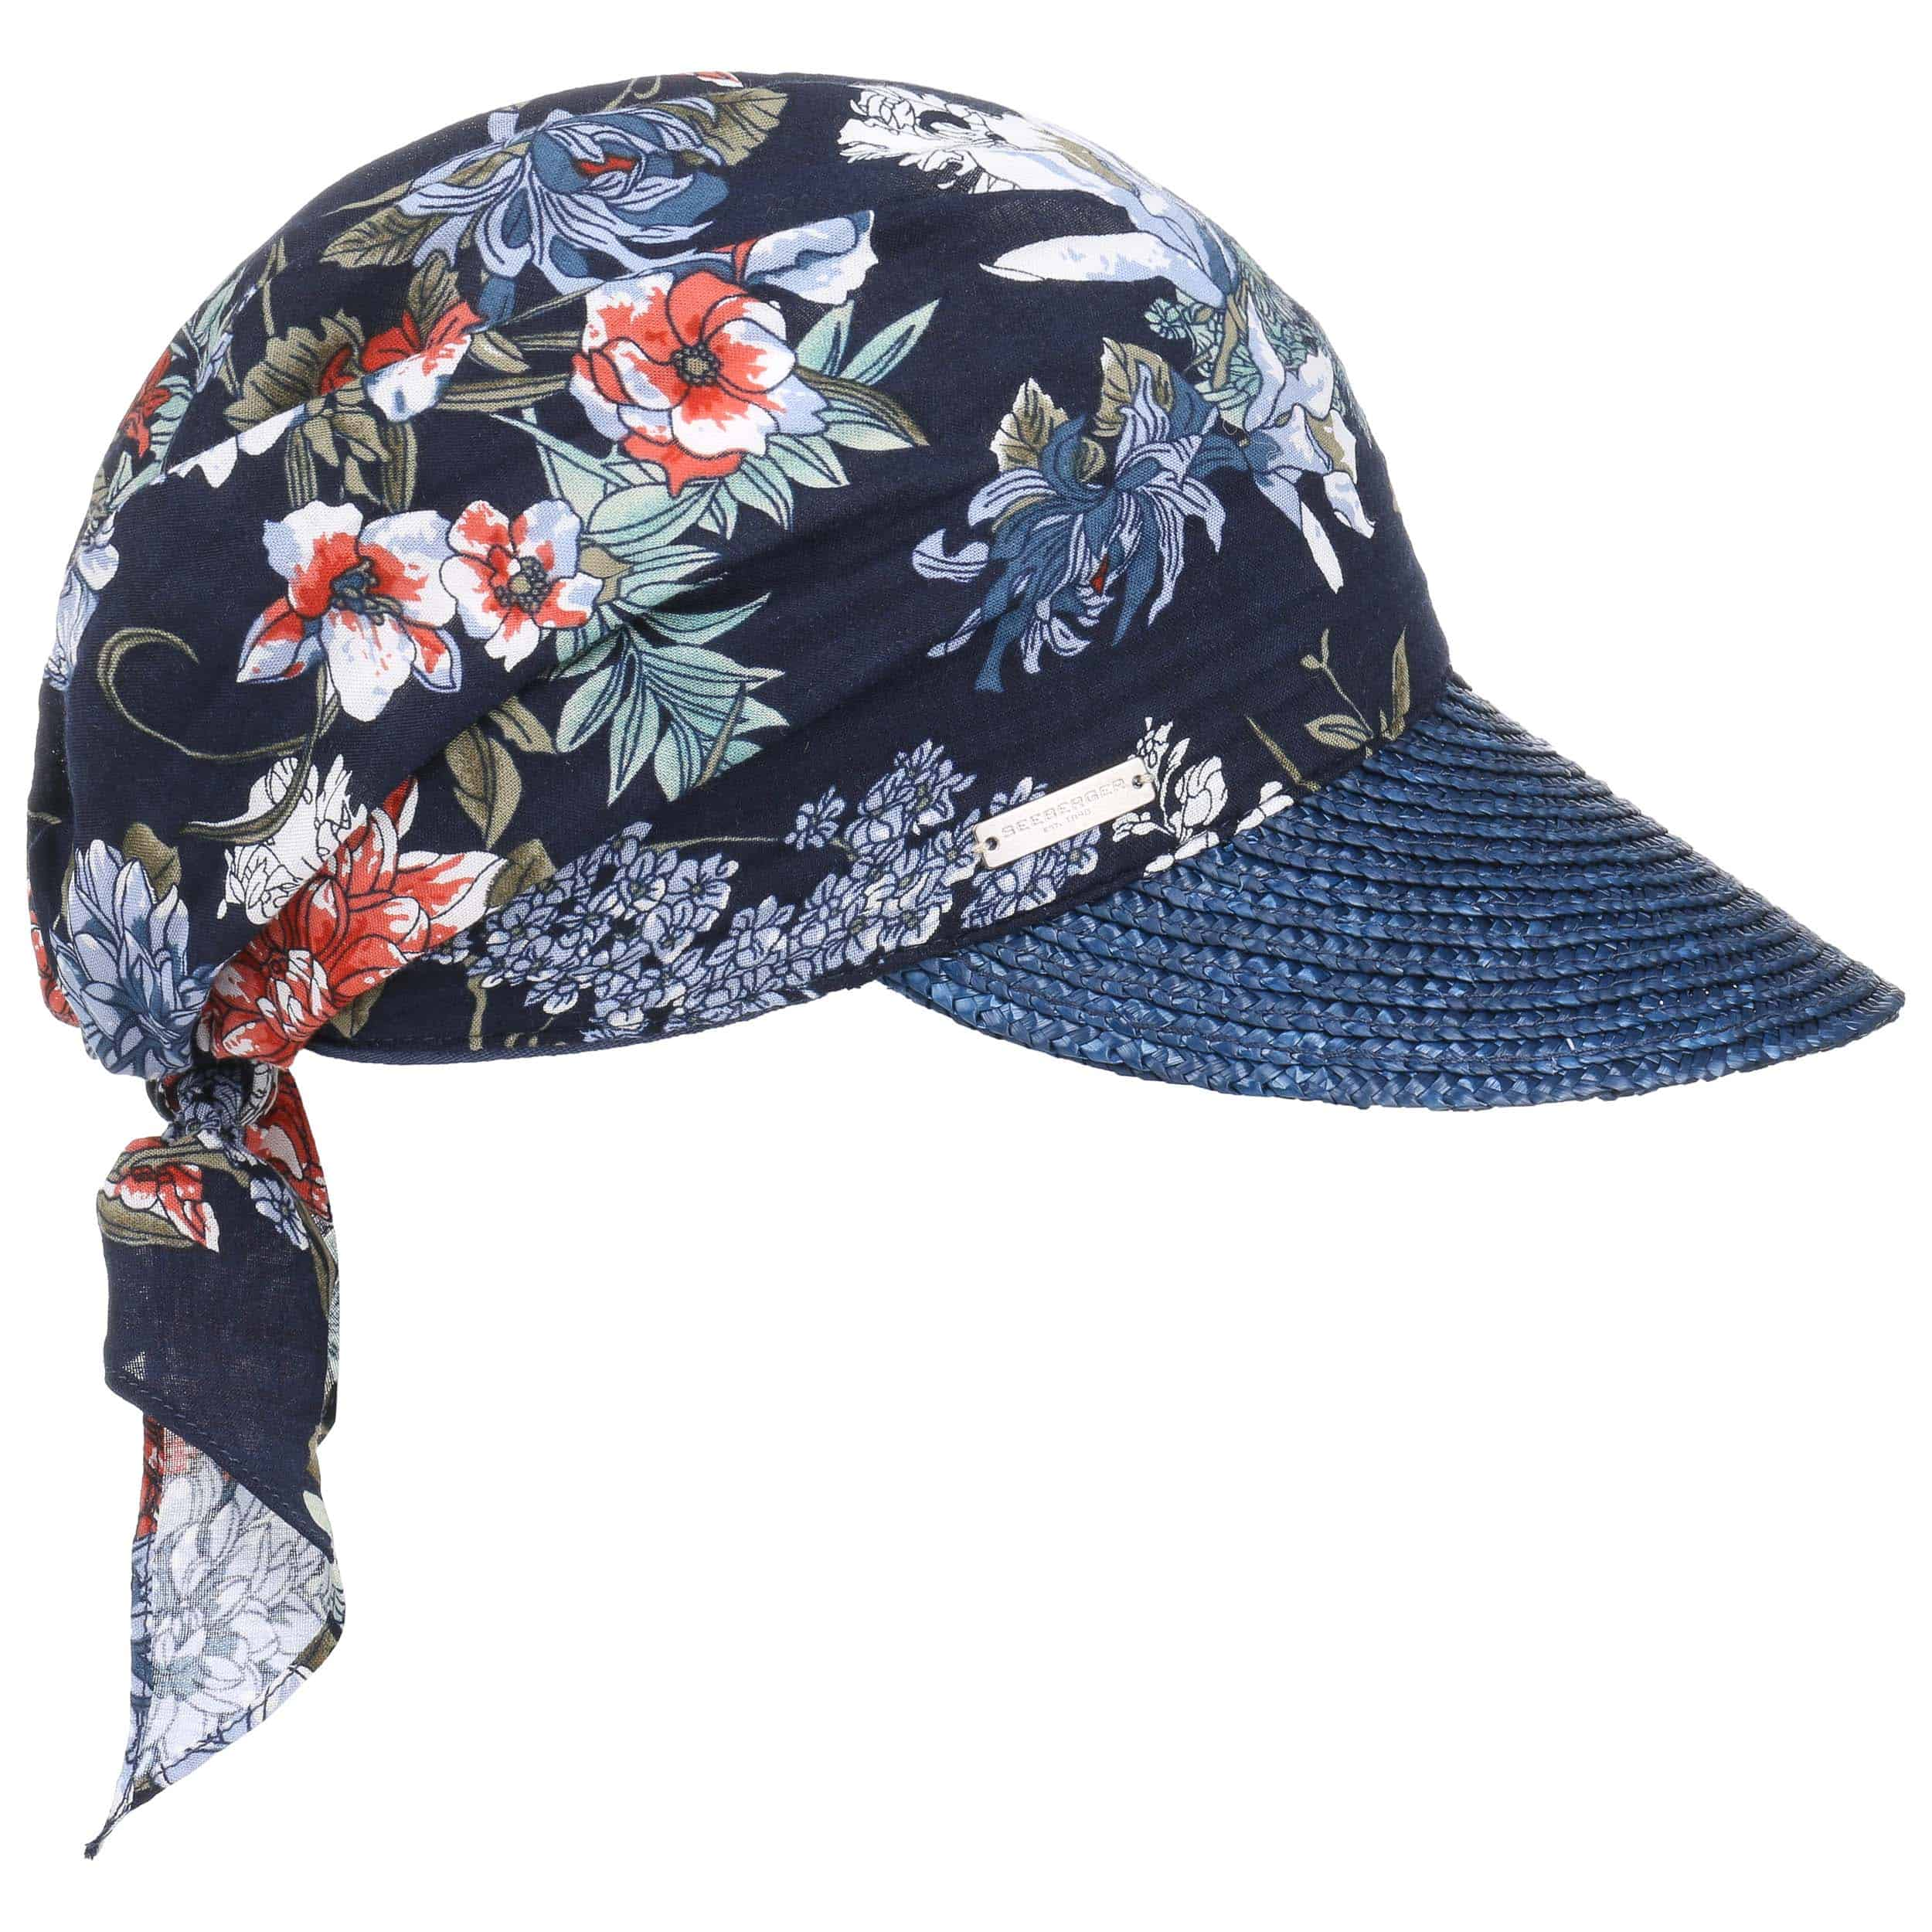 Flower High Uv Bandana Cap By Seeberger Eur 39 95